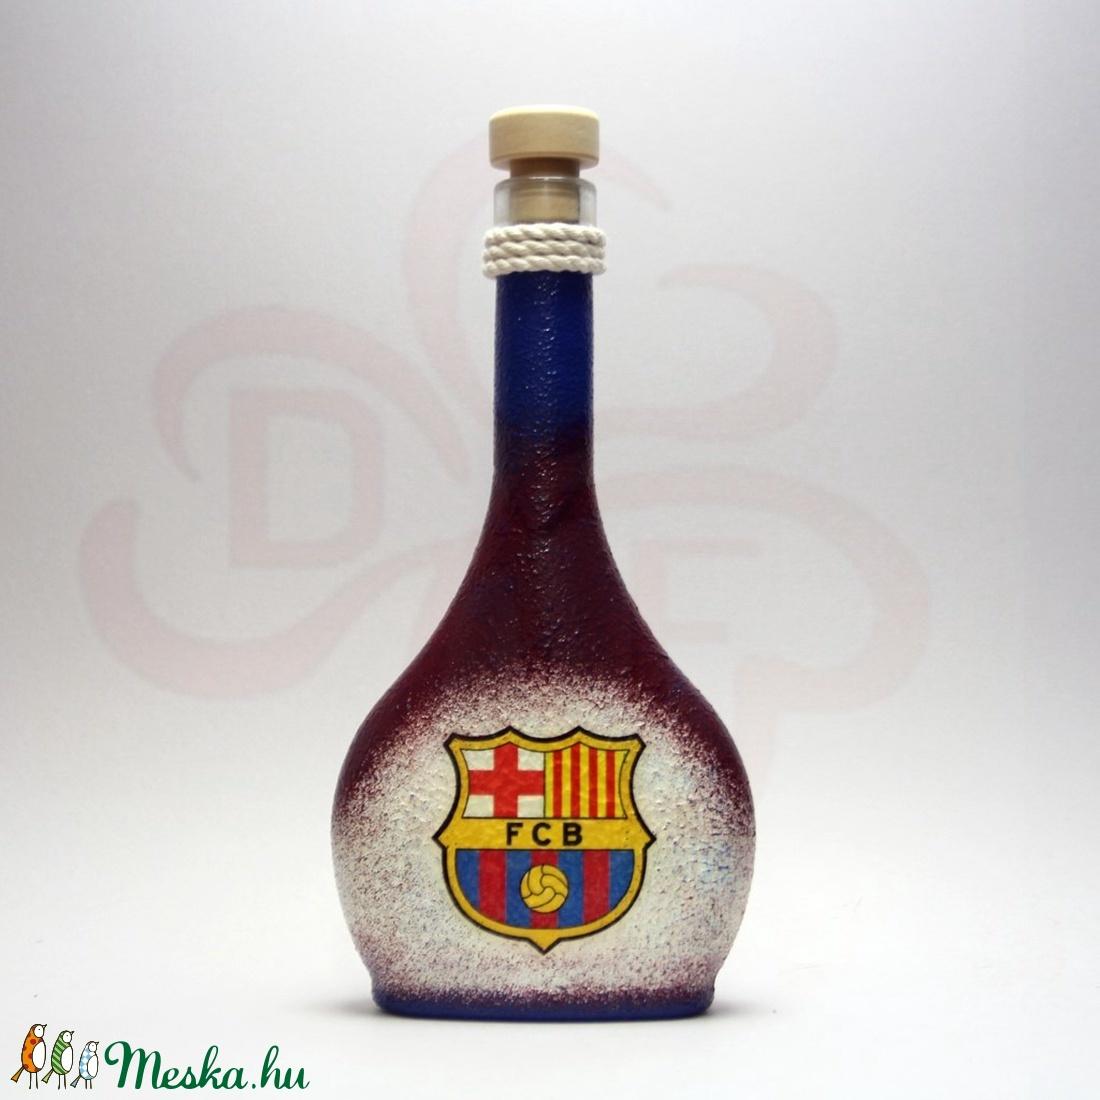 FC Barcelona italos üveg ; Barcelona futball szurkolóknak - Meska.hu